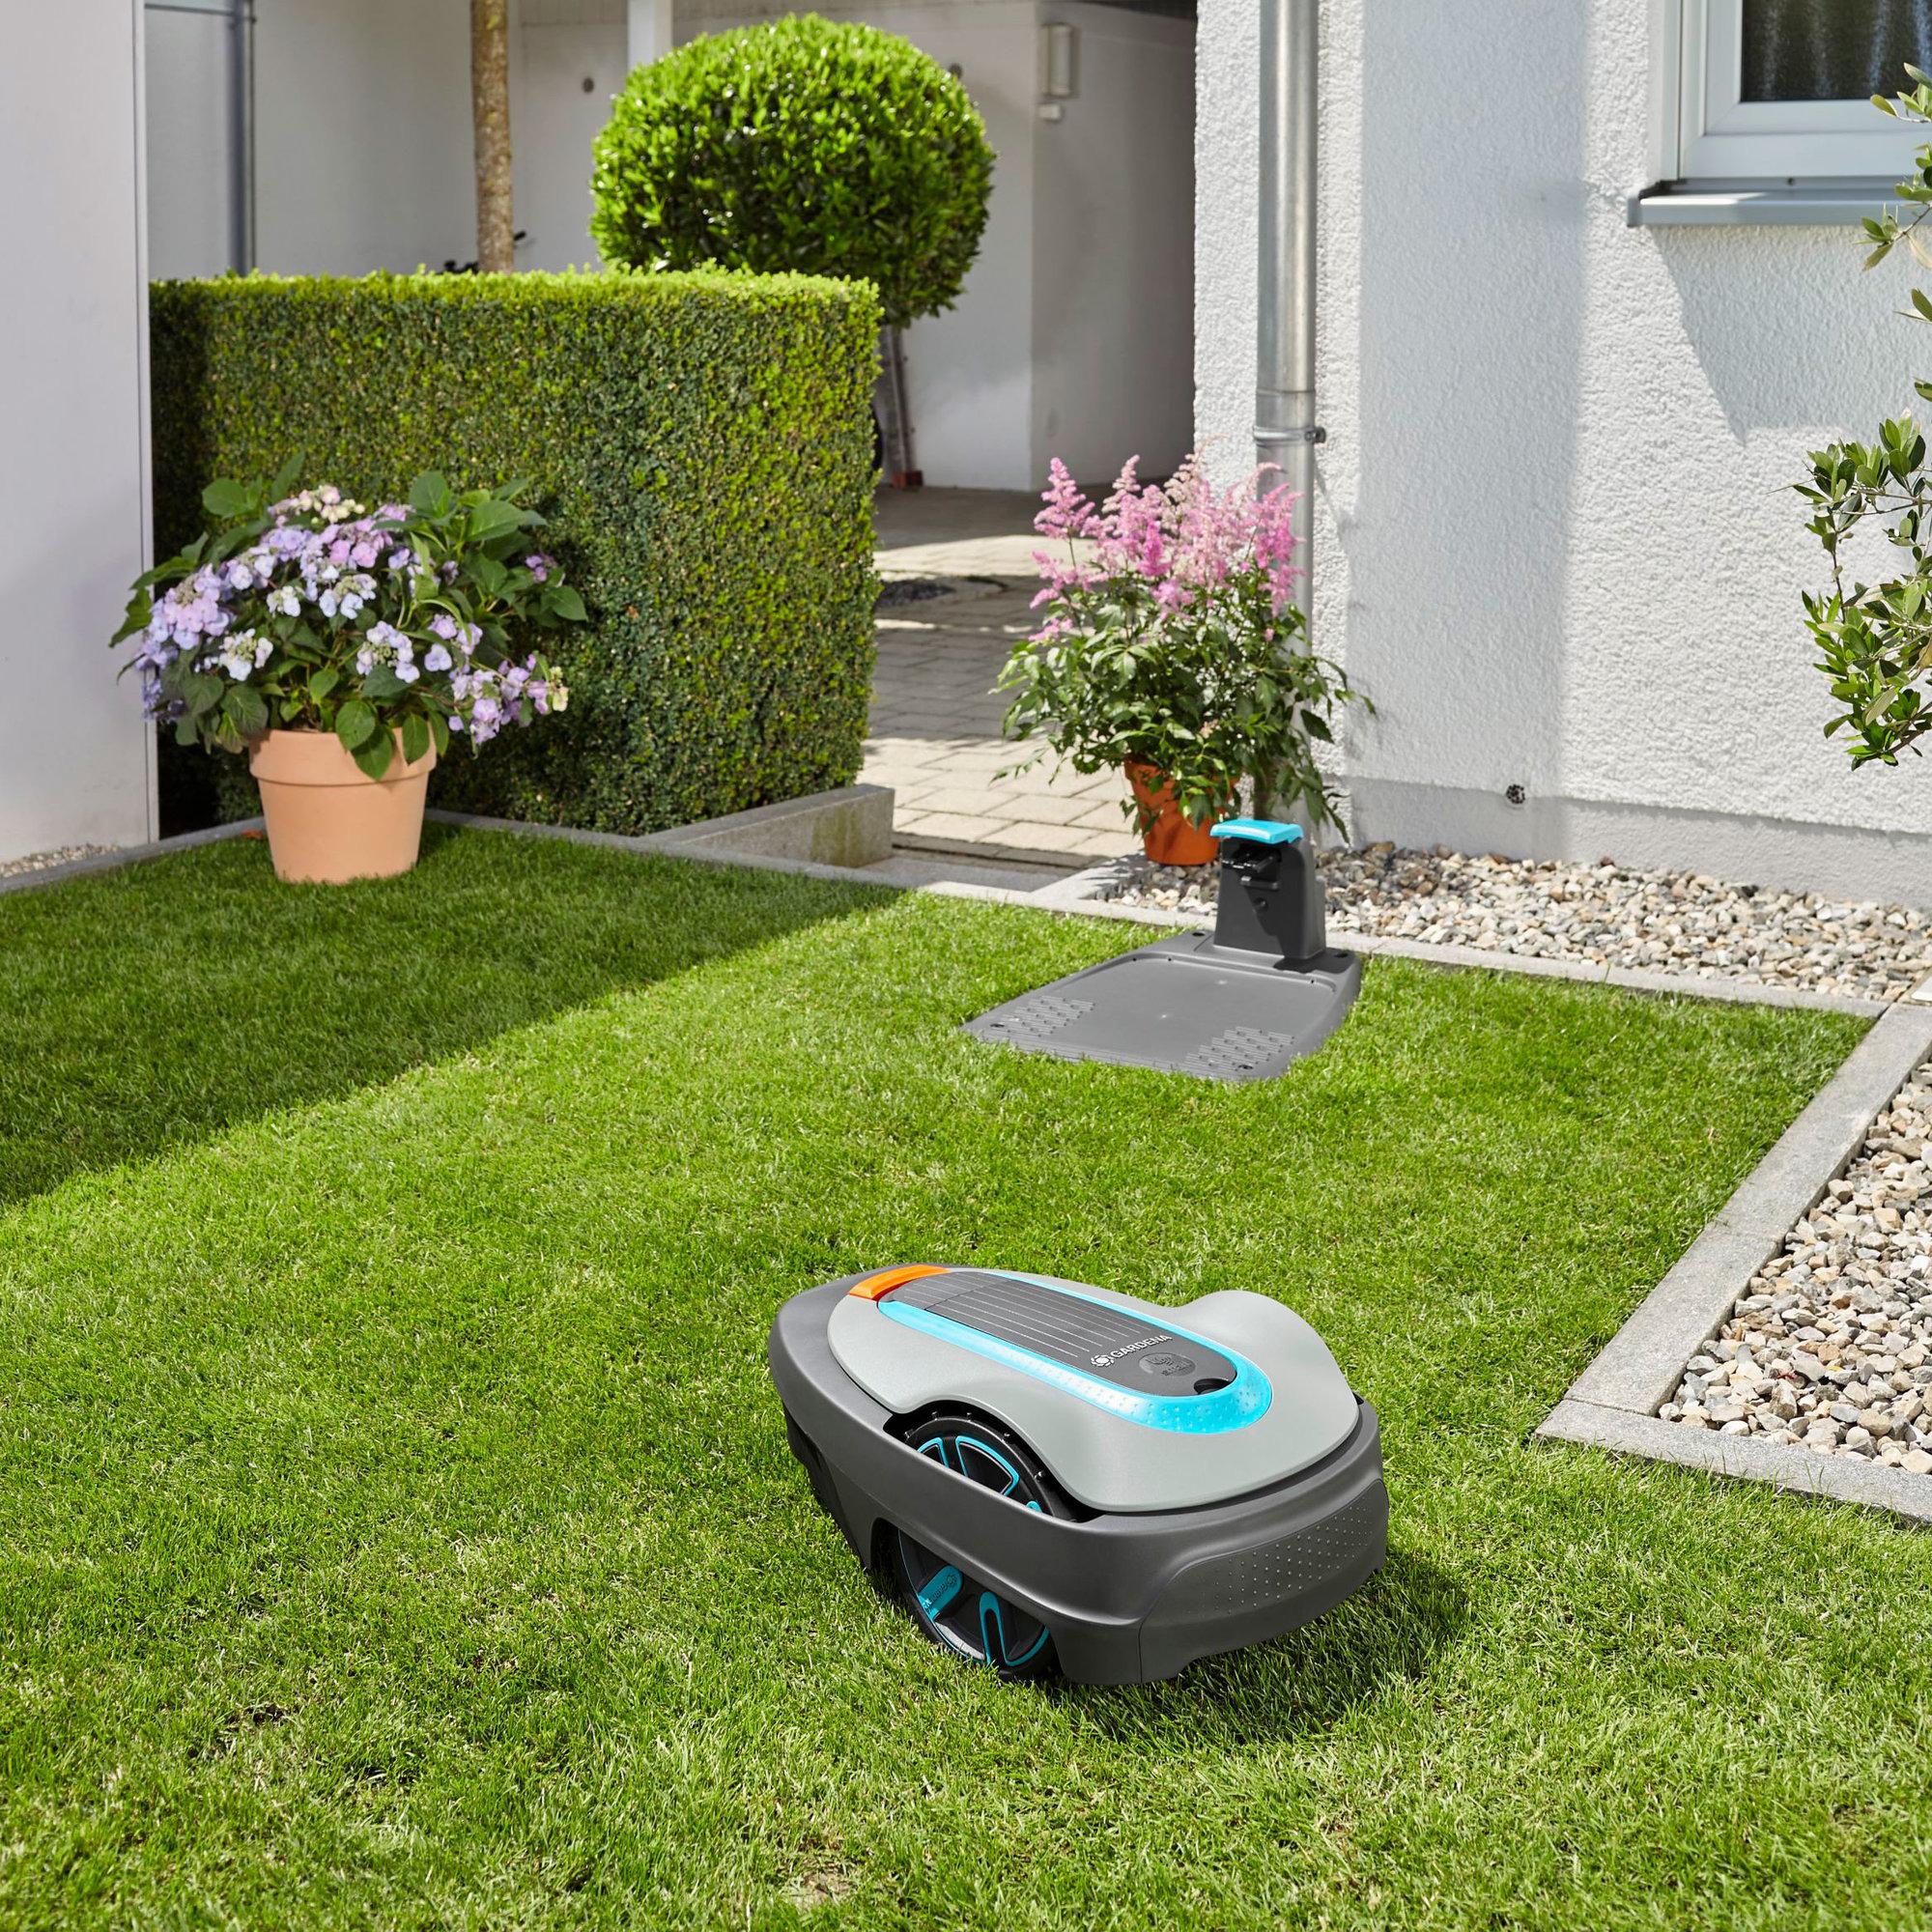 bestil sileno city 250 robotpl neklipper fra gardena. Black Bedroom Furniture Sets. Home Design Ideas